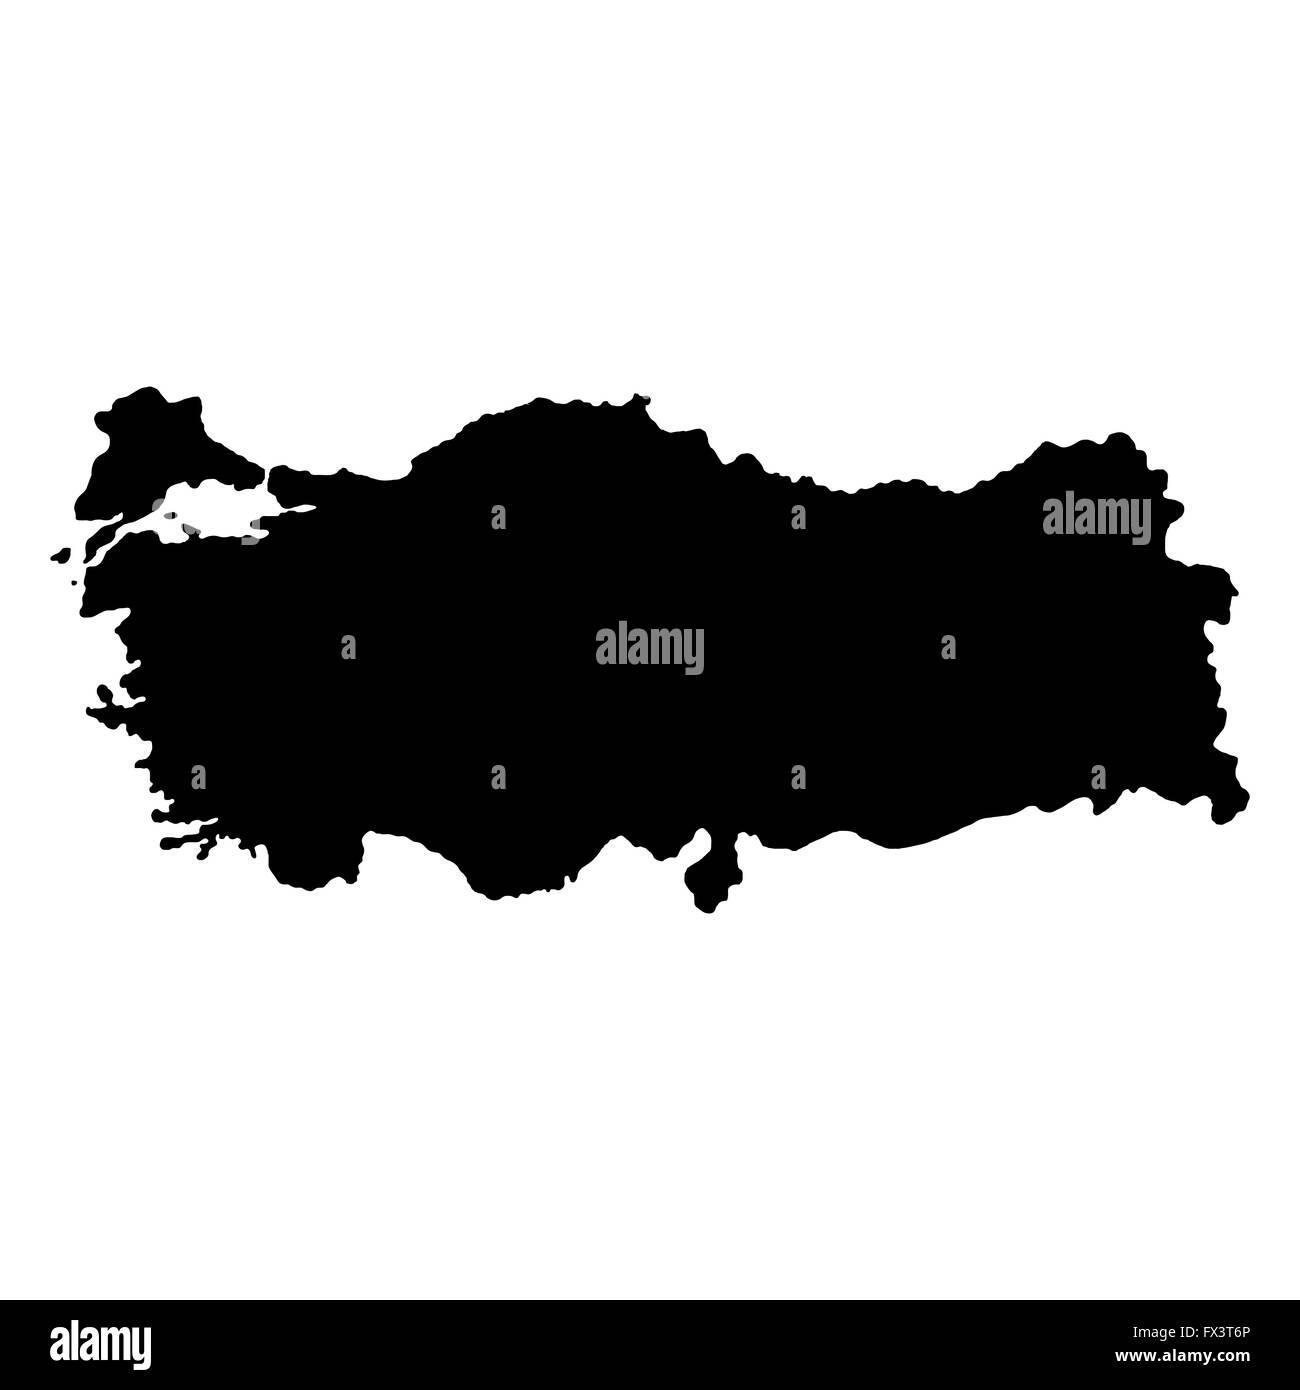 Turkey map on a white background - Stock Image